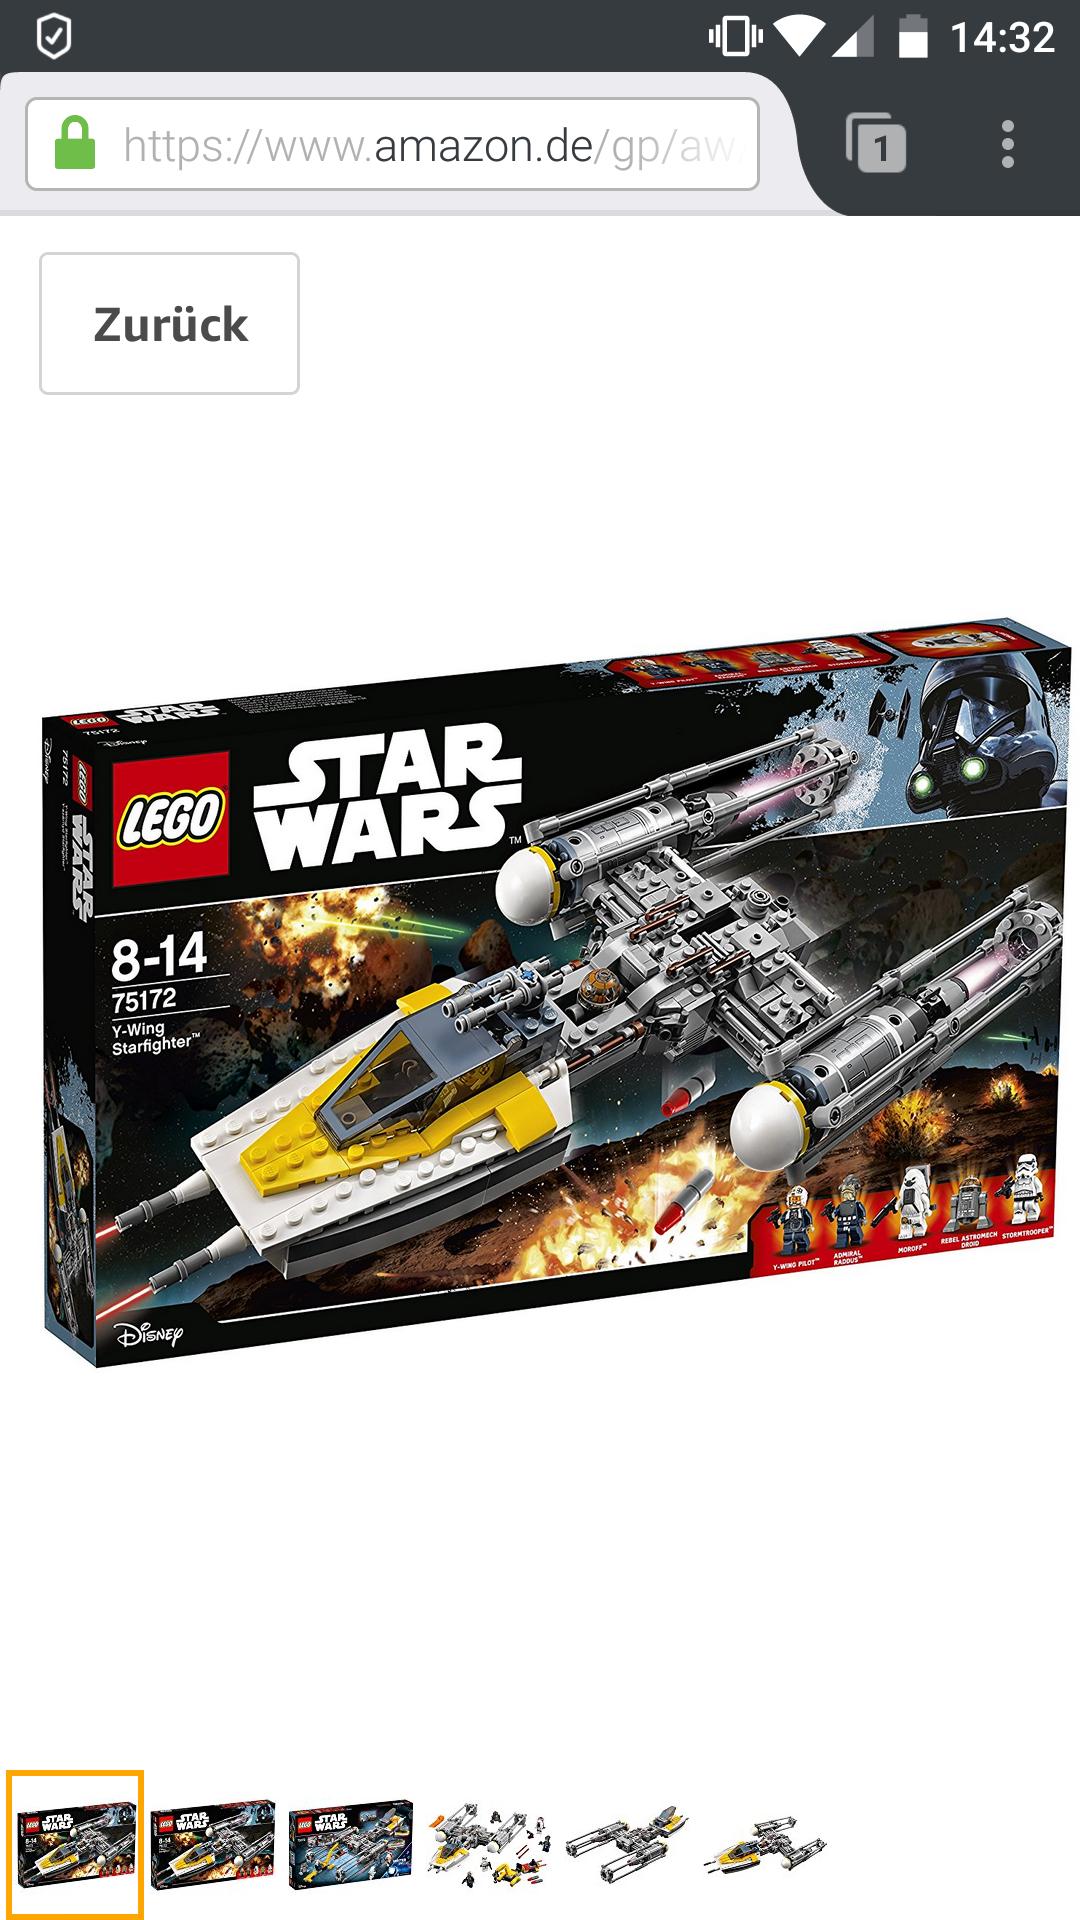 Lego Star Wars 75152 Y-Wing Starfighter